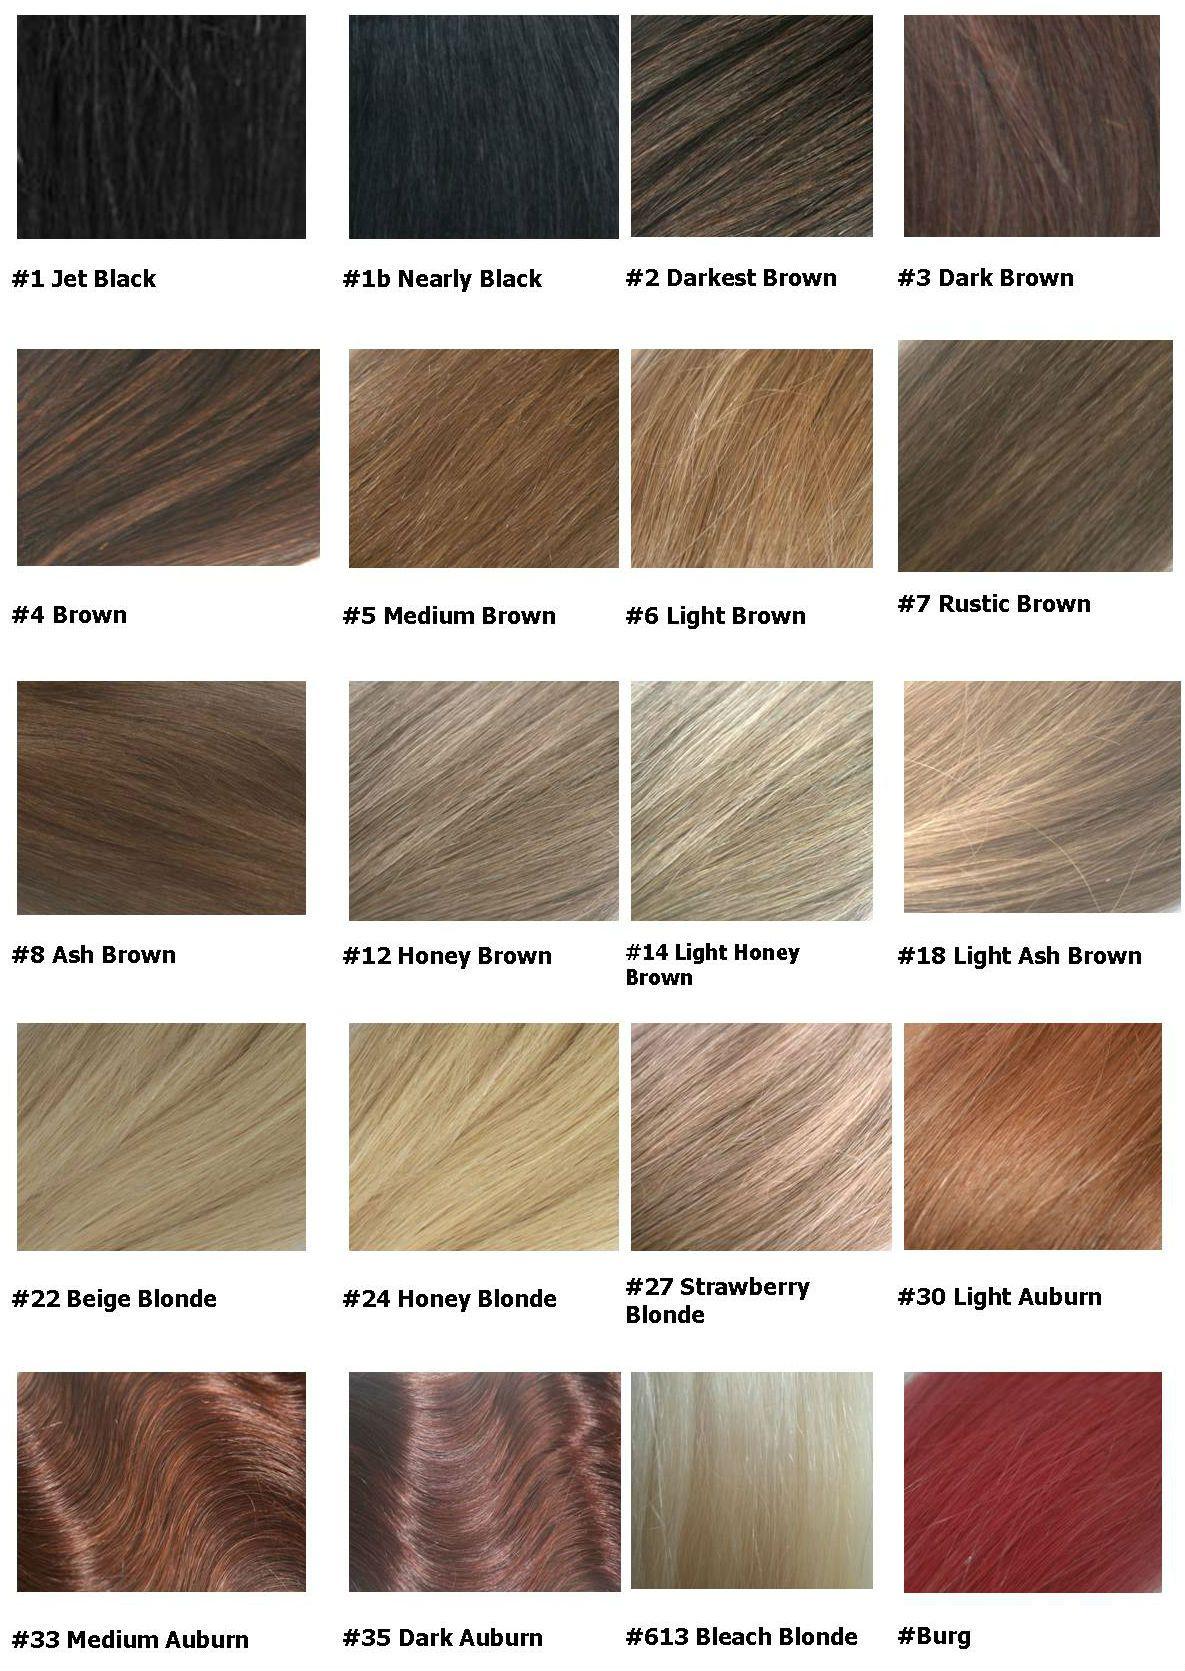 Basic Hair Colors Chart 2016 Gabor Loreal Wella Revlon Garnier Beige Blonde Hair Color Light Ash Brown Hair Blonde Hair Color Chart